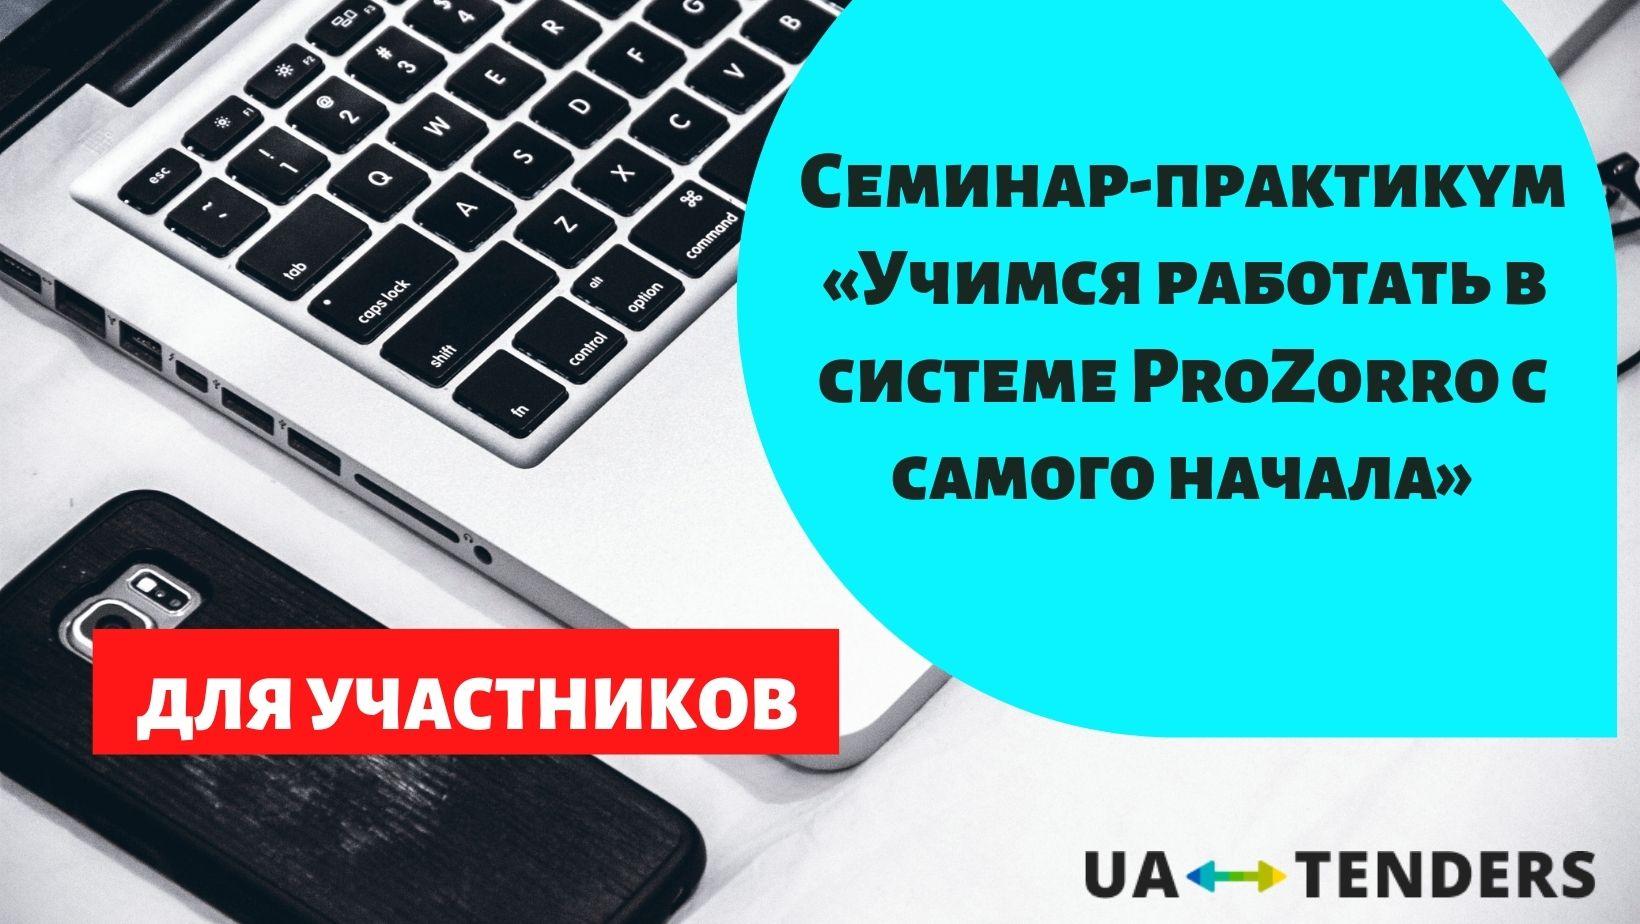 Семинар-практикум «Учимся работать в системе ProZorro с самого начала»